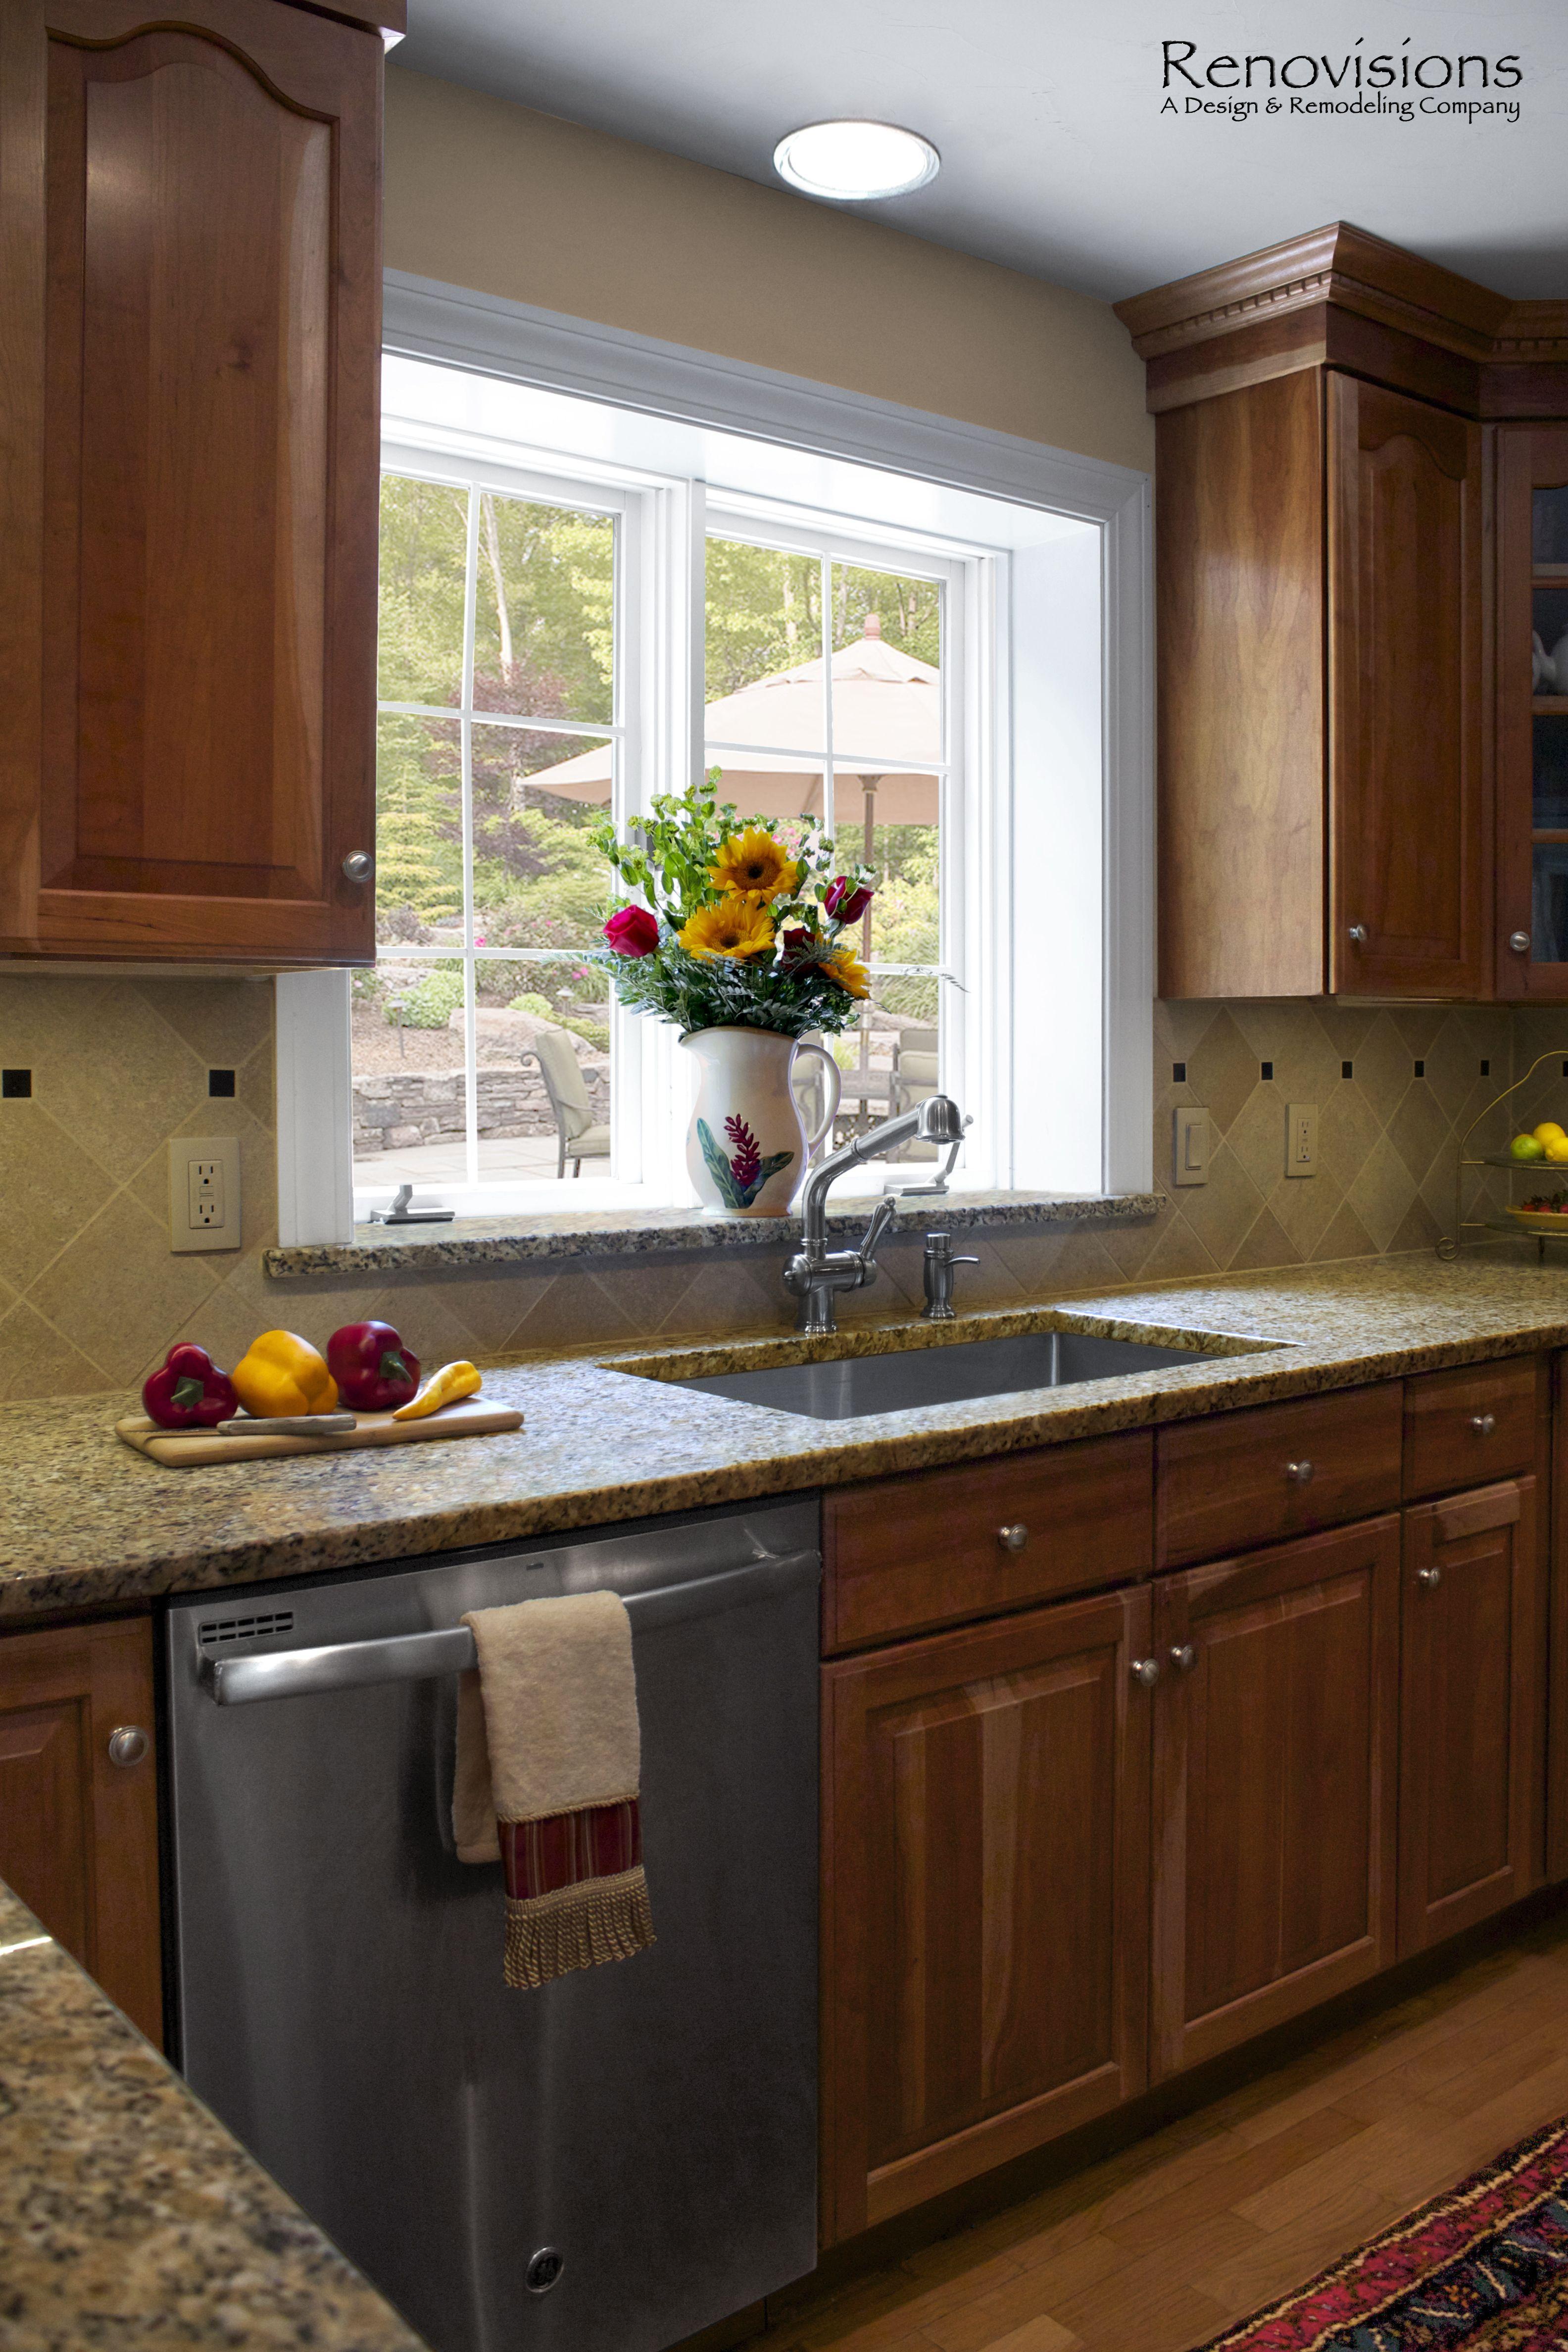 Kitchen Backsplash By Window kitchen remodelrenovisions. decorative tan and black tile